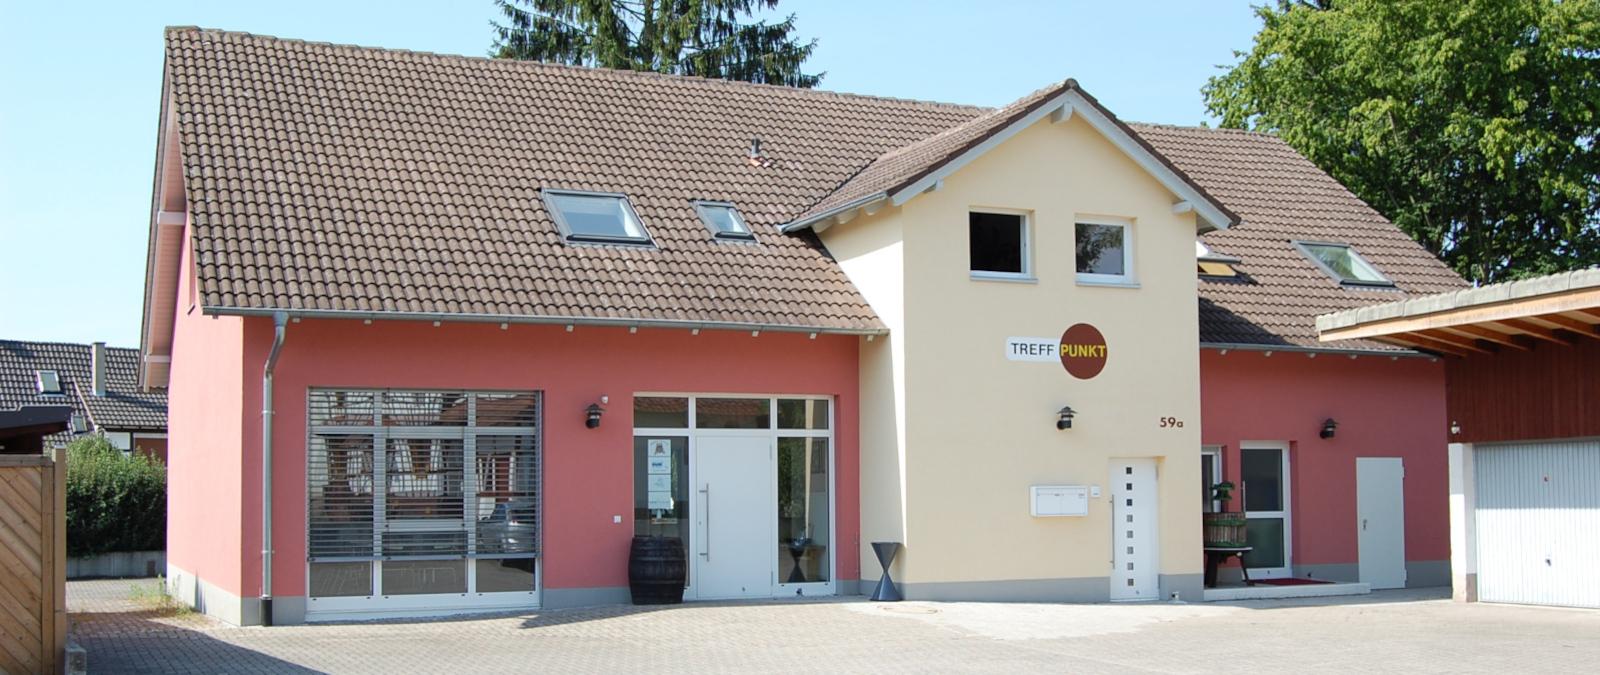 Ortsverwaltung in Willstätt (Treffpunkt)